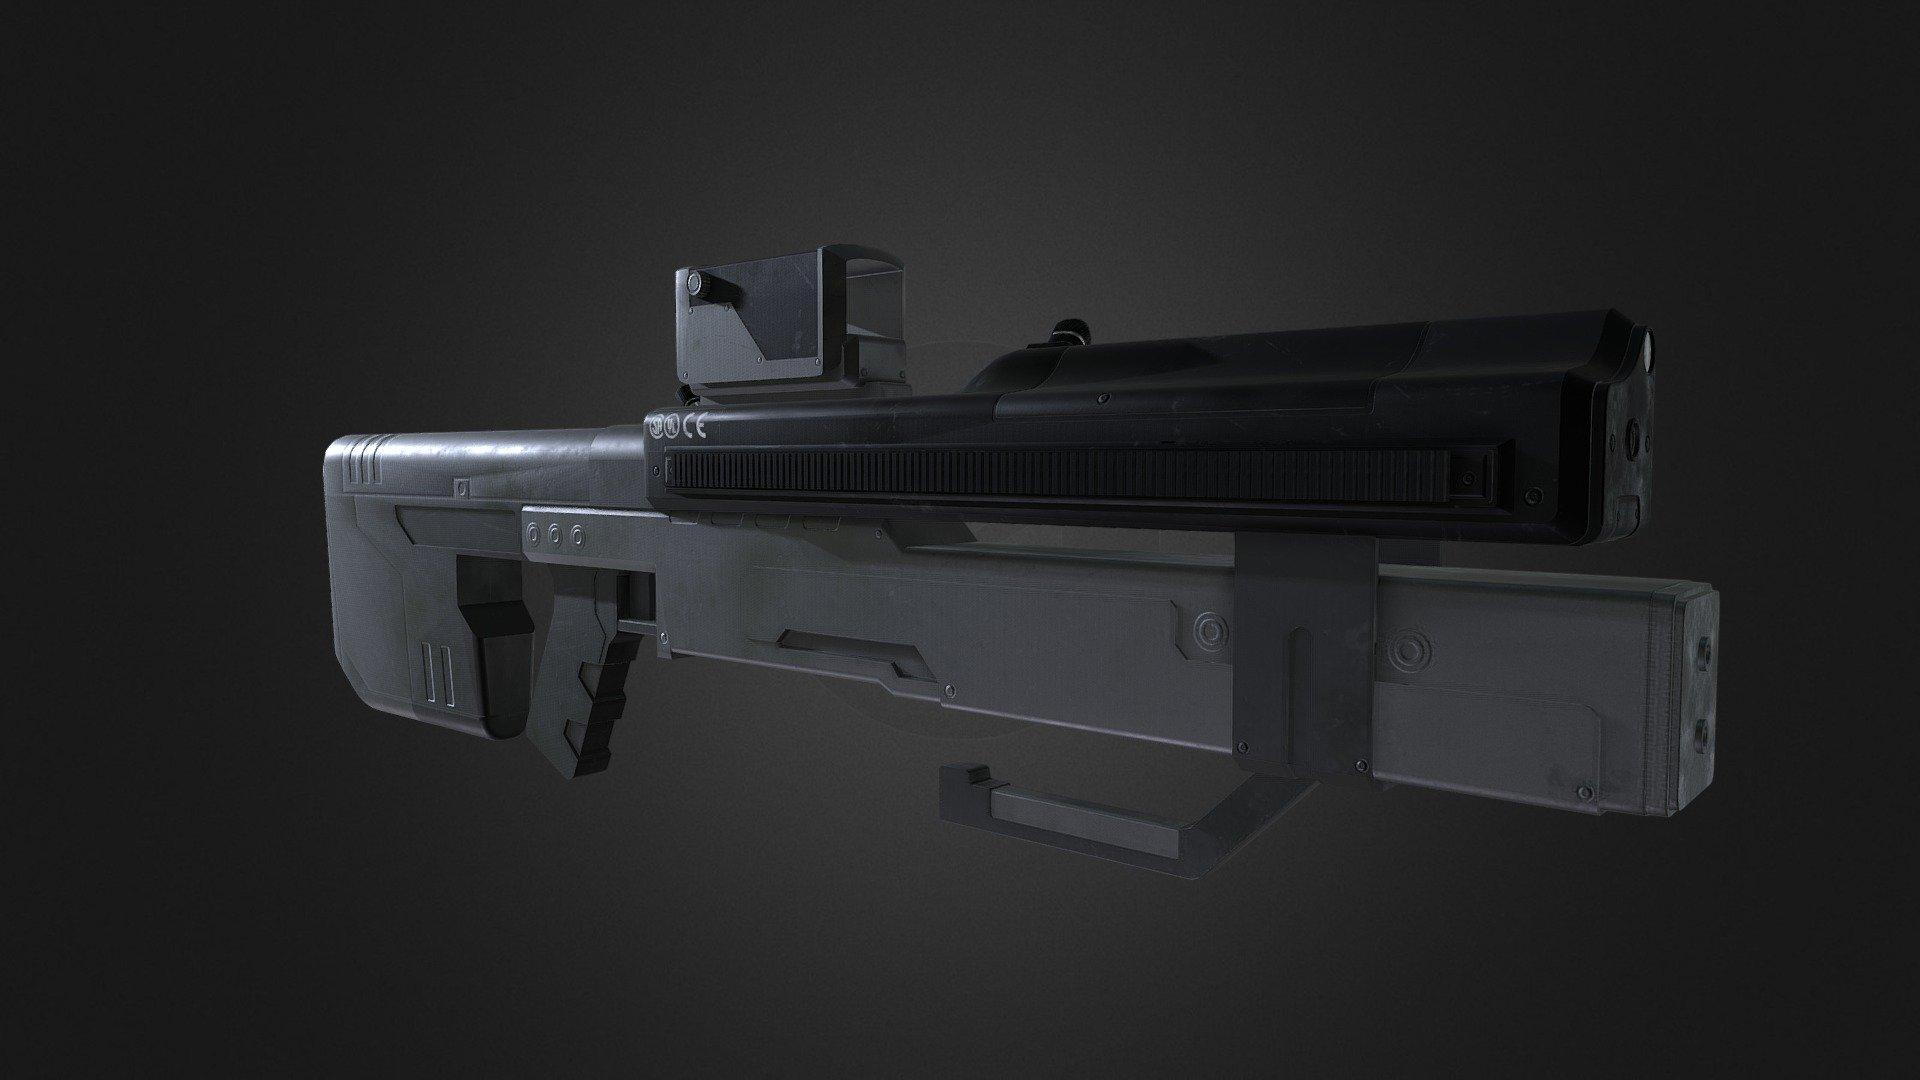 Halo Landfall Laser Designator 3d Model By Jedii Jedii